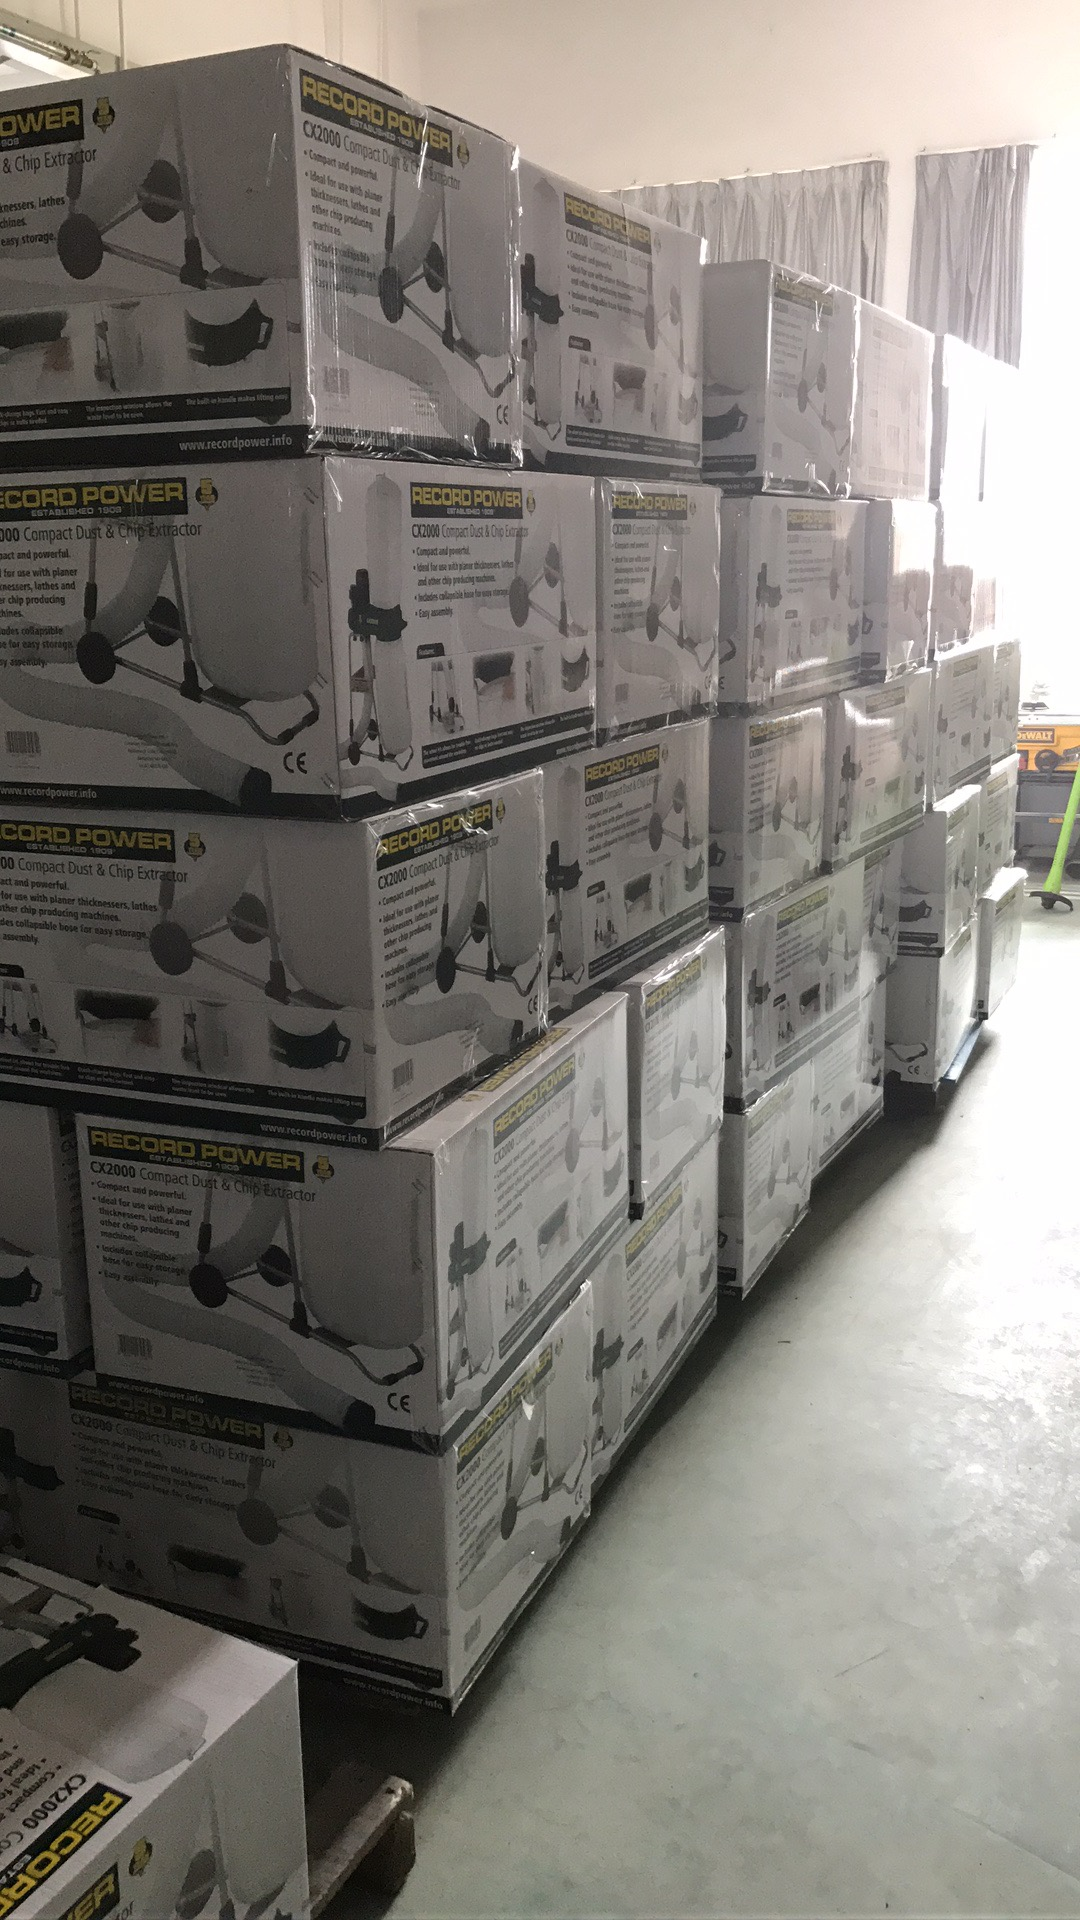 Máy hút bụi Record Power CX2000 (QT9501 OEM)